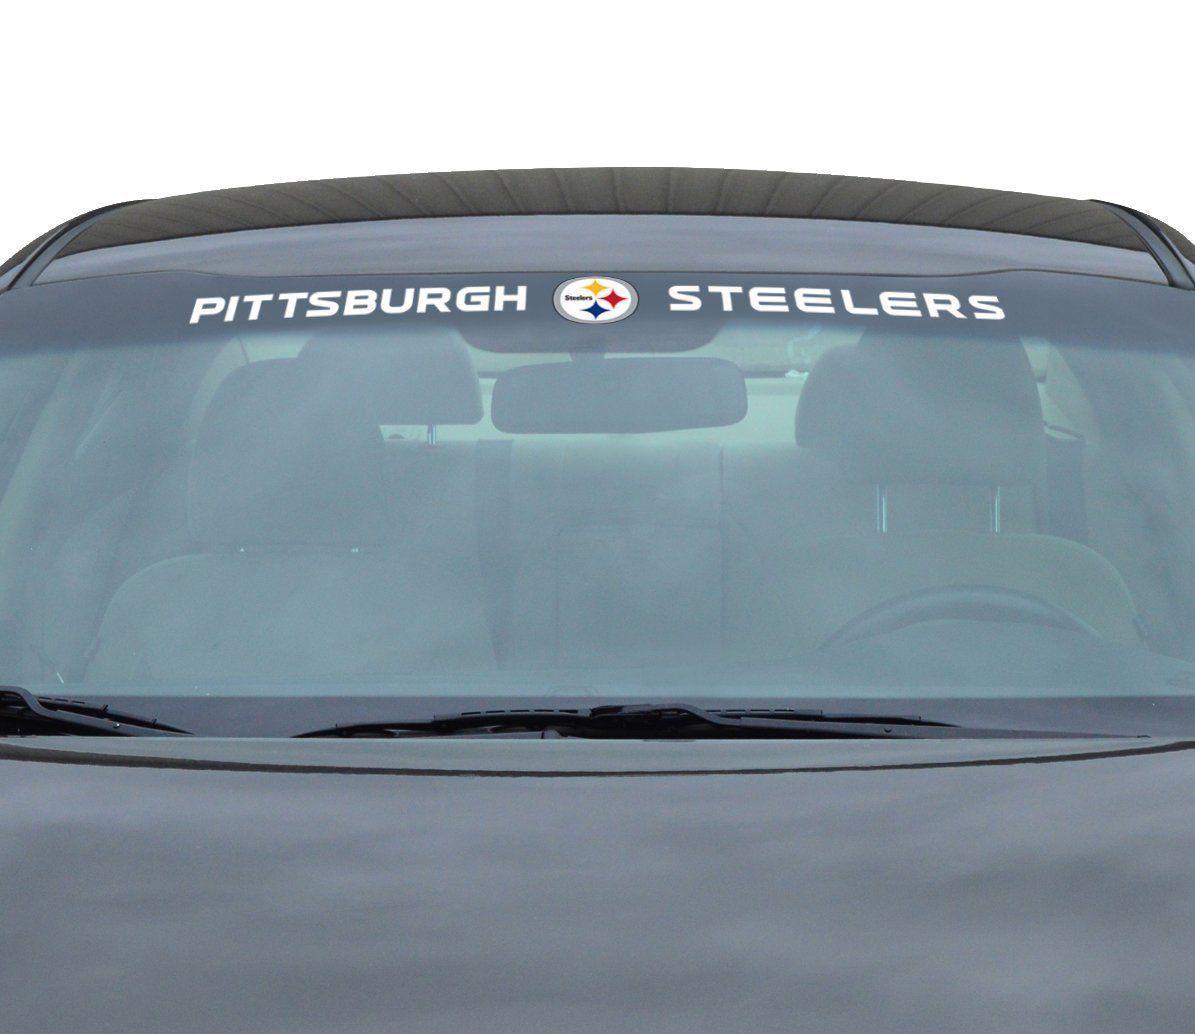 "PITTSBURGH STEELERS 35"" X 4"" WINDSHIELD REAR WINDOW DECAL CAR TRUCK NFL FOOTBALL"